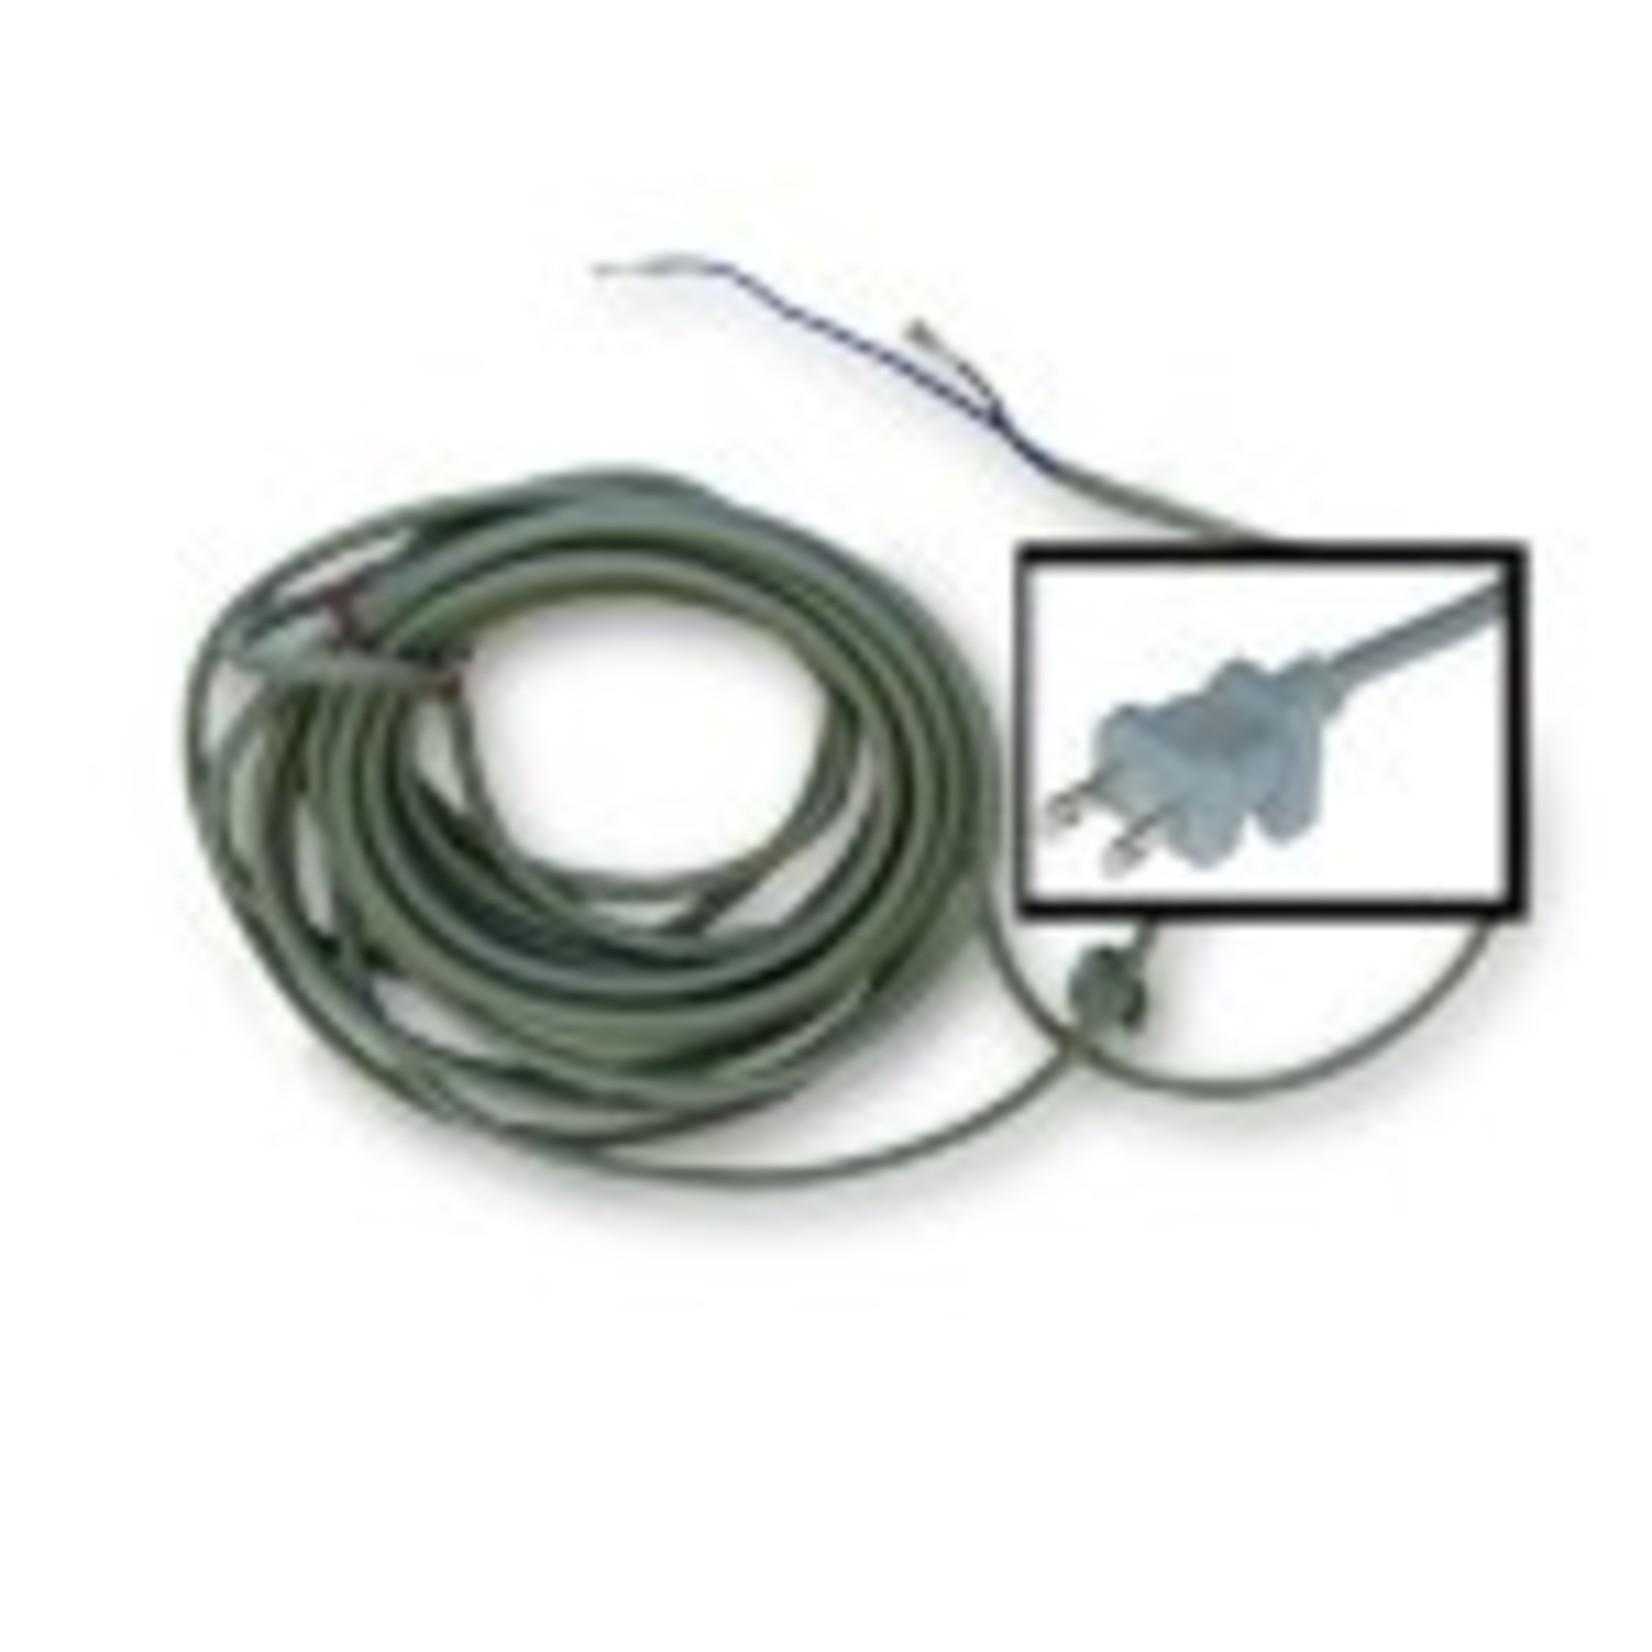 Dyson Dyson DC18 Power Cord - Fits DC07/14/17/25